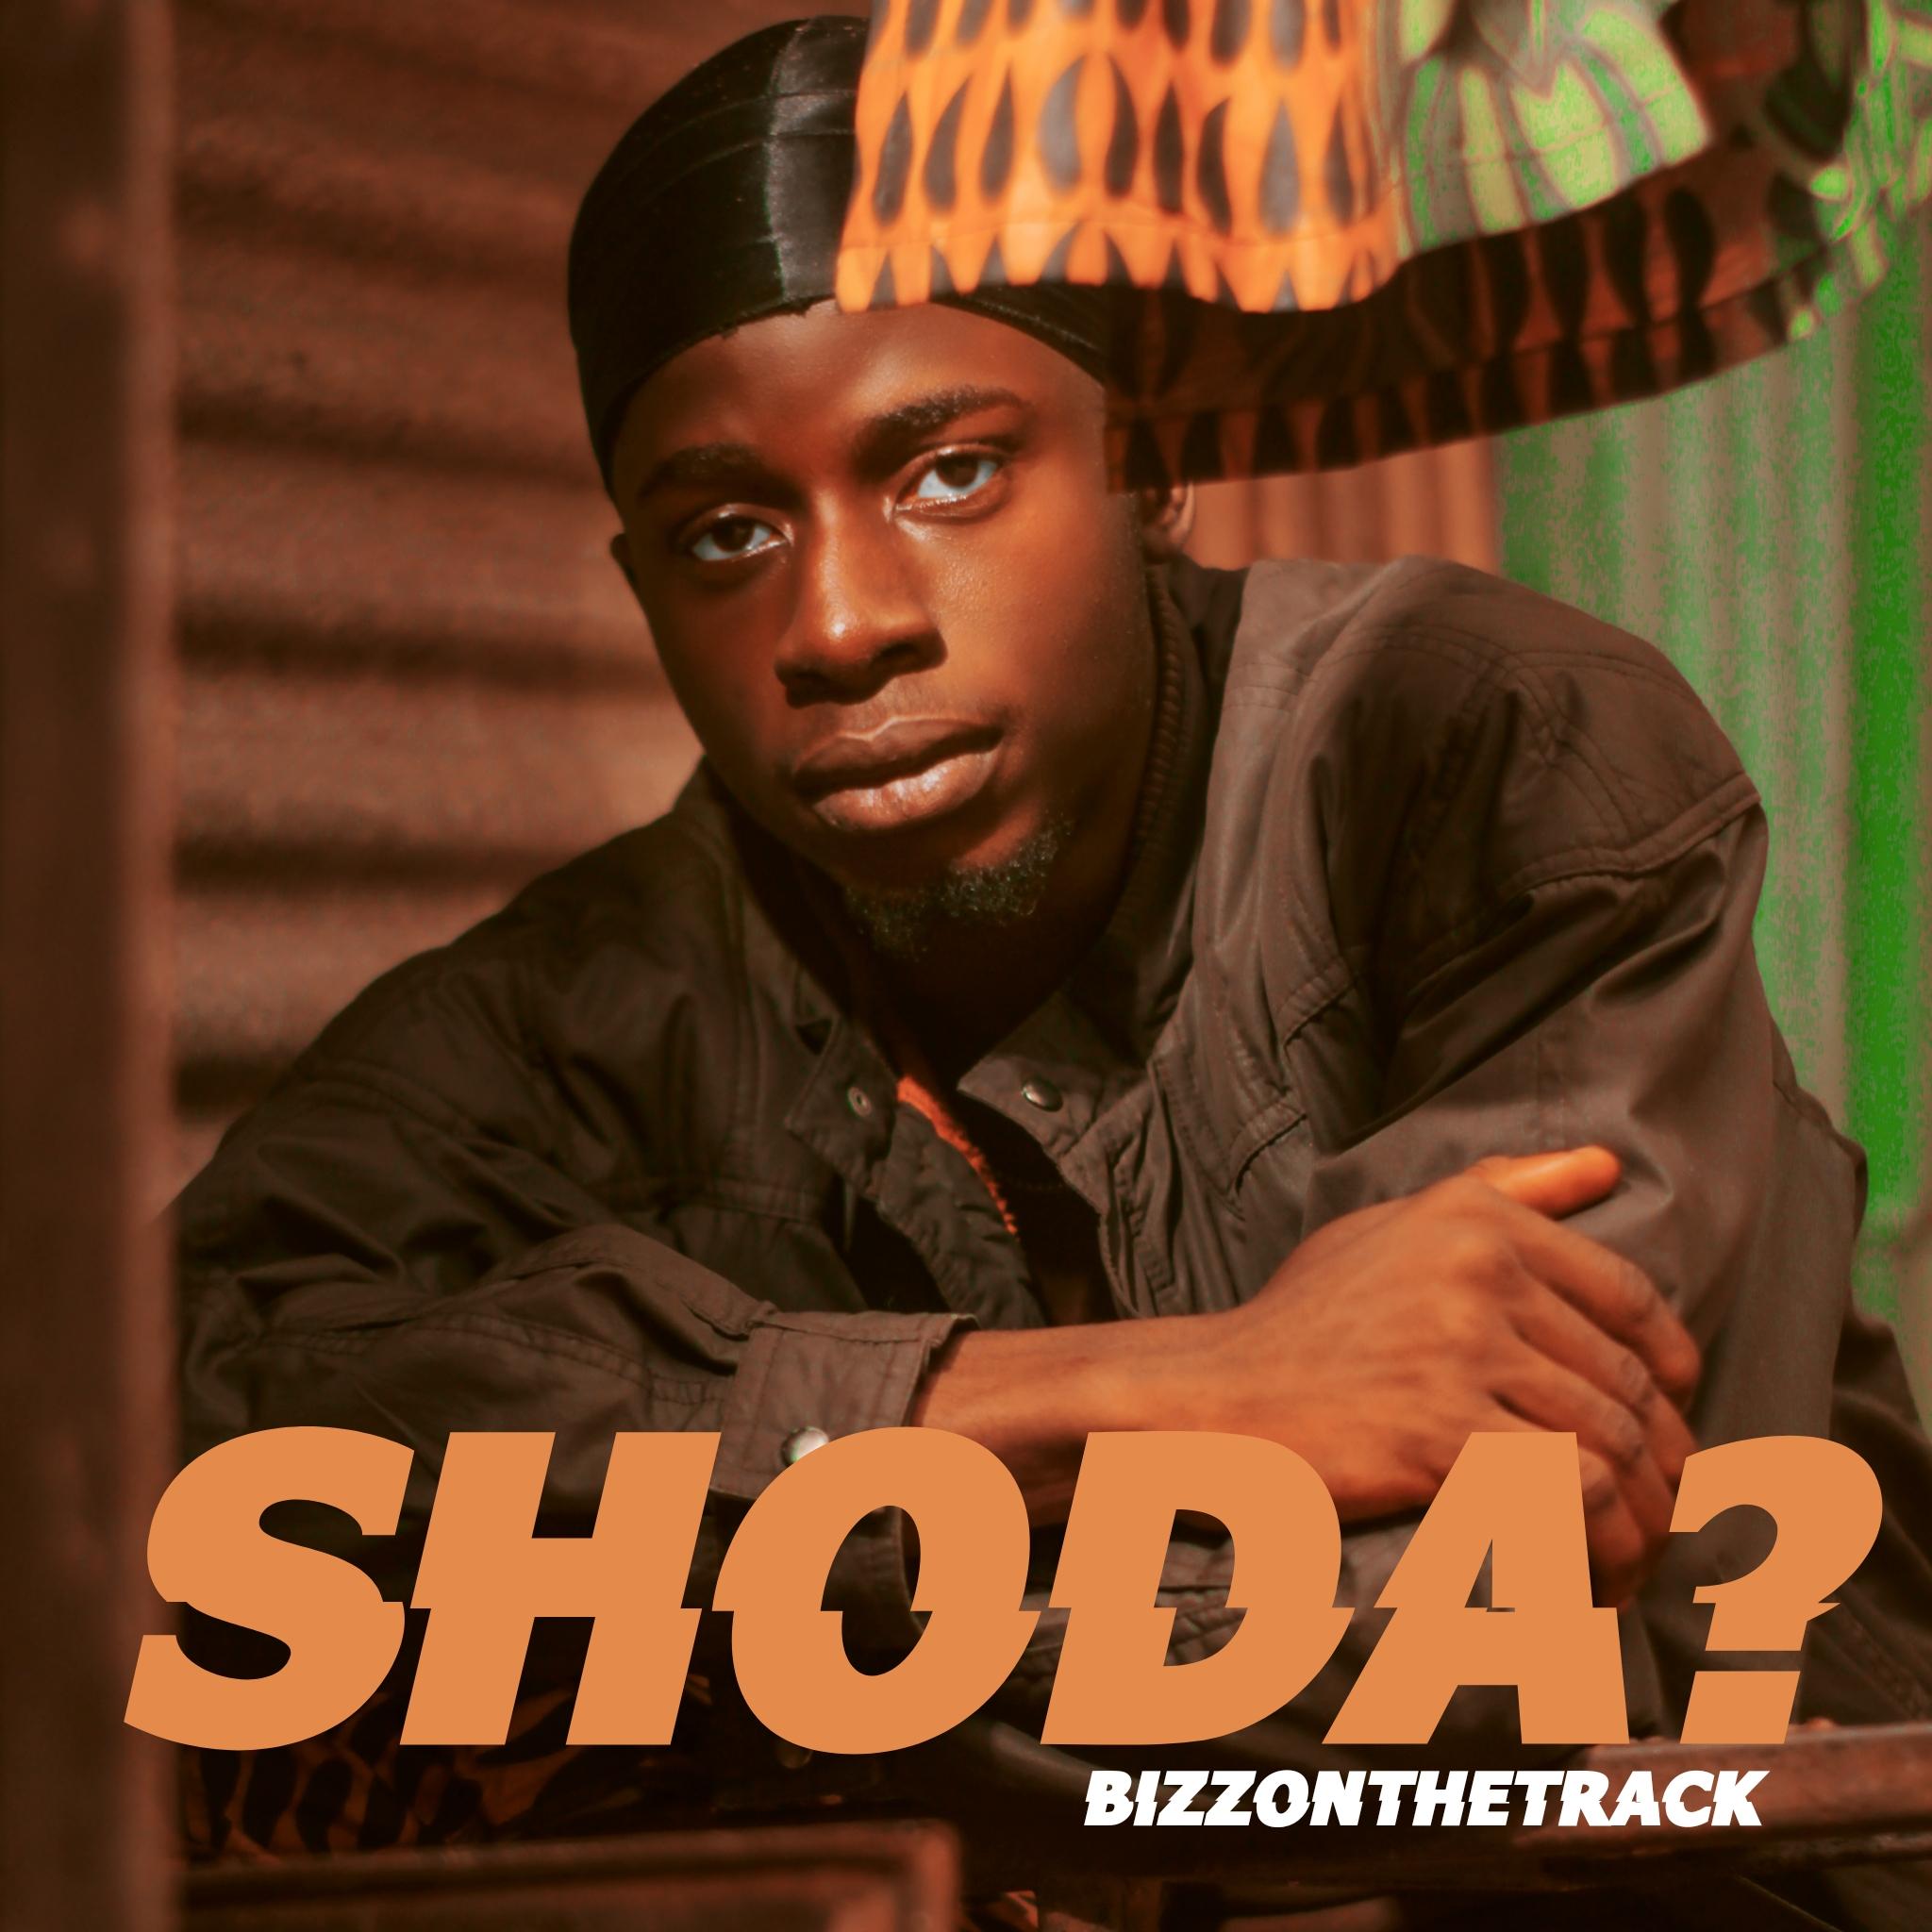 Shoda? Image